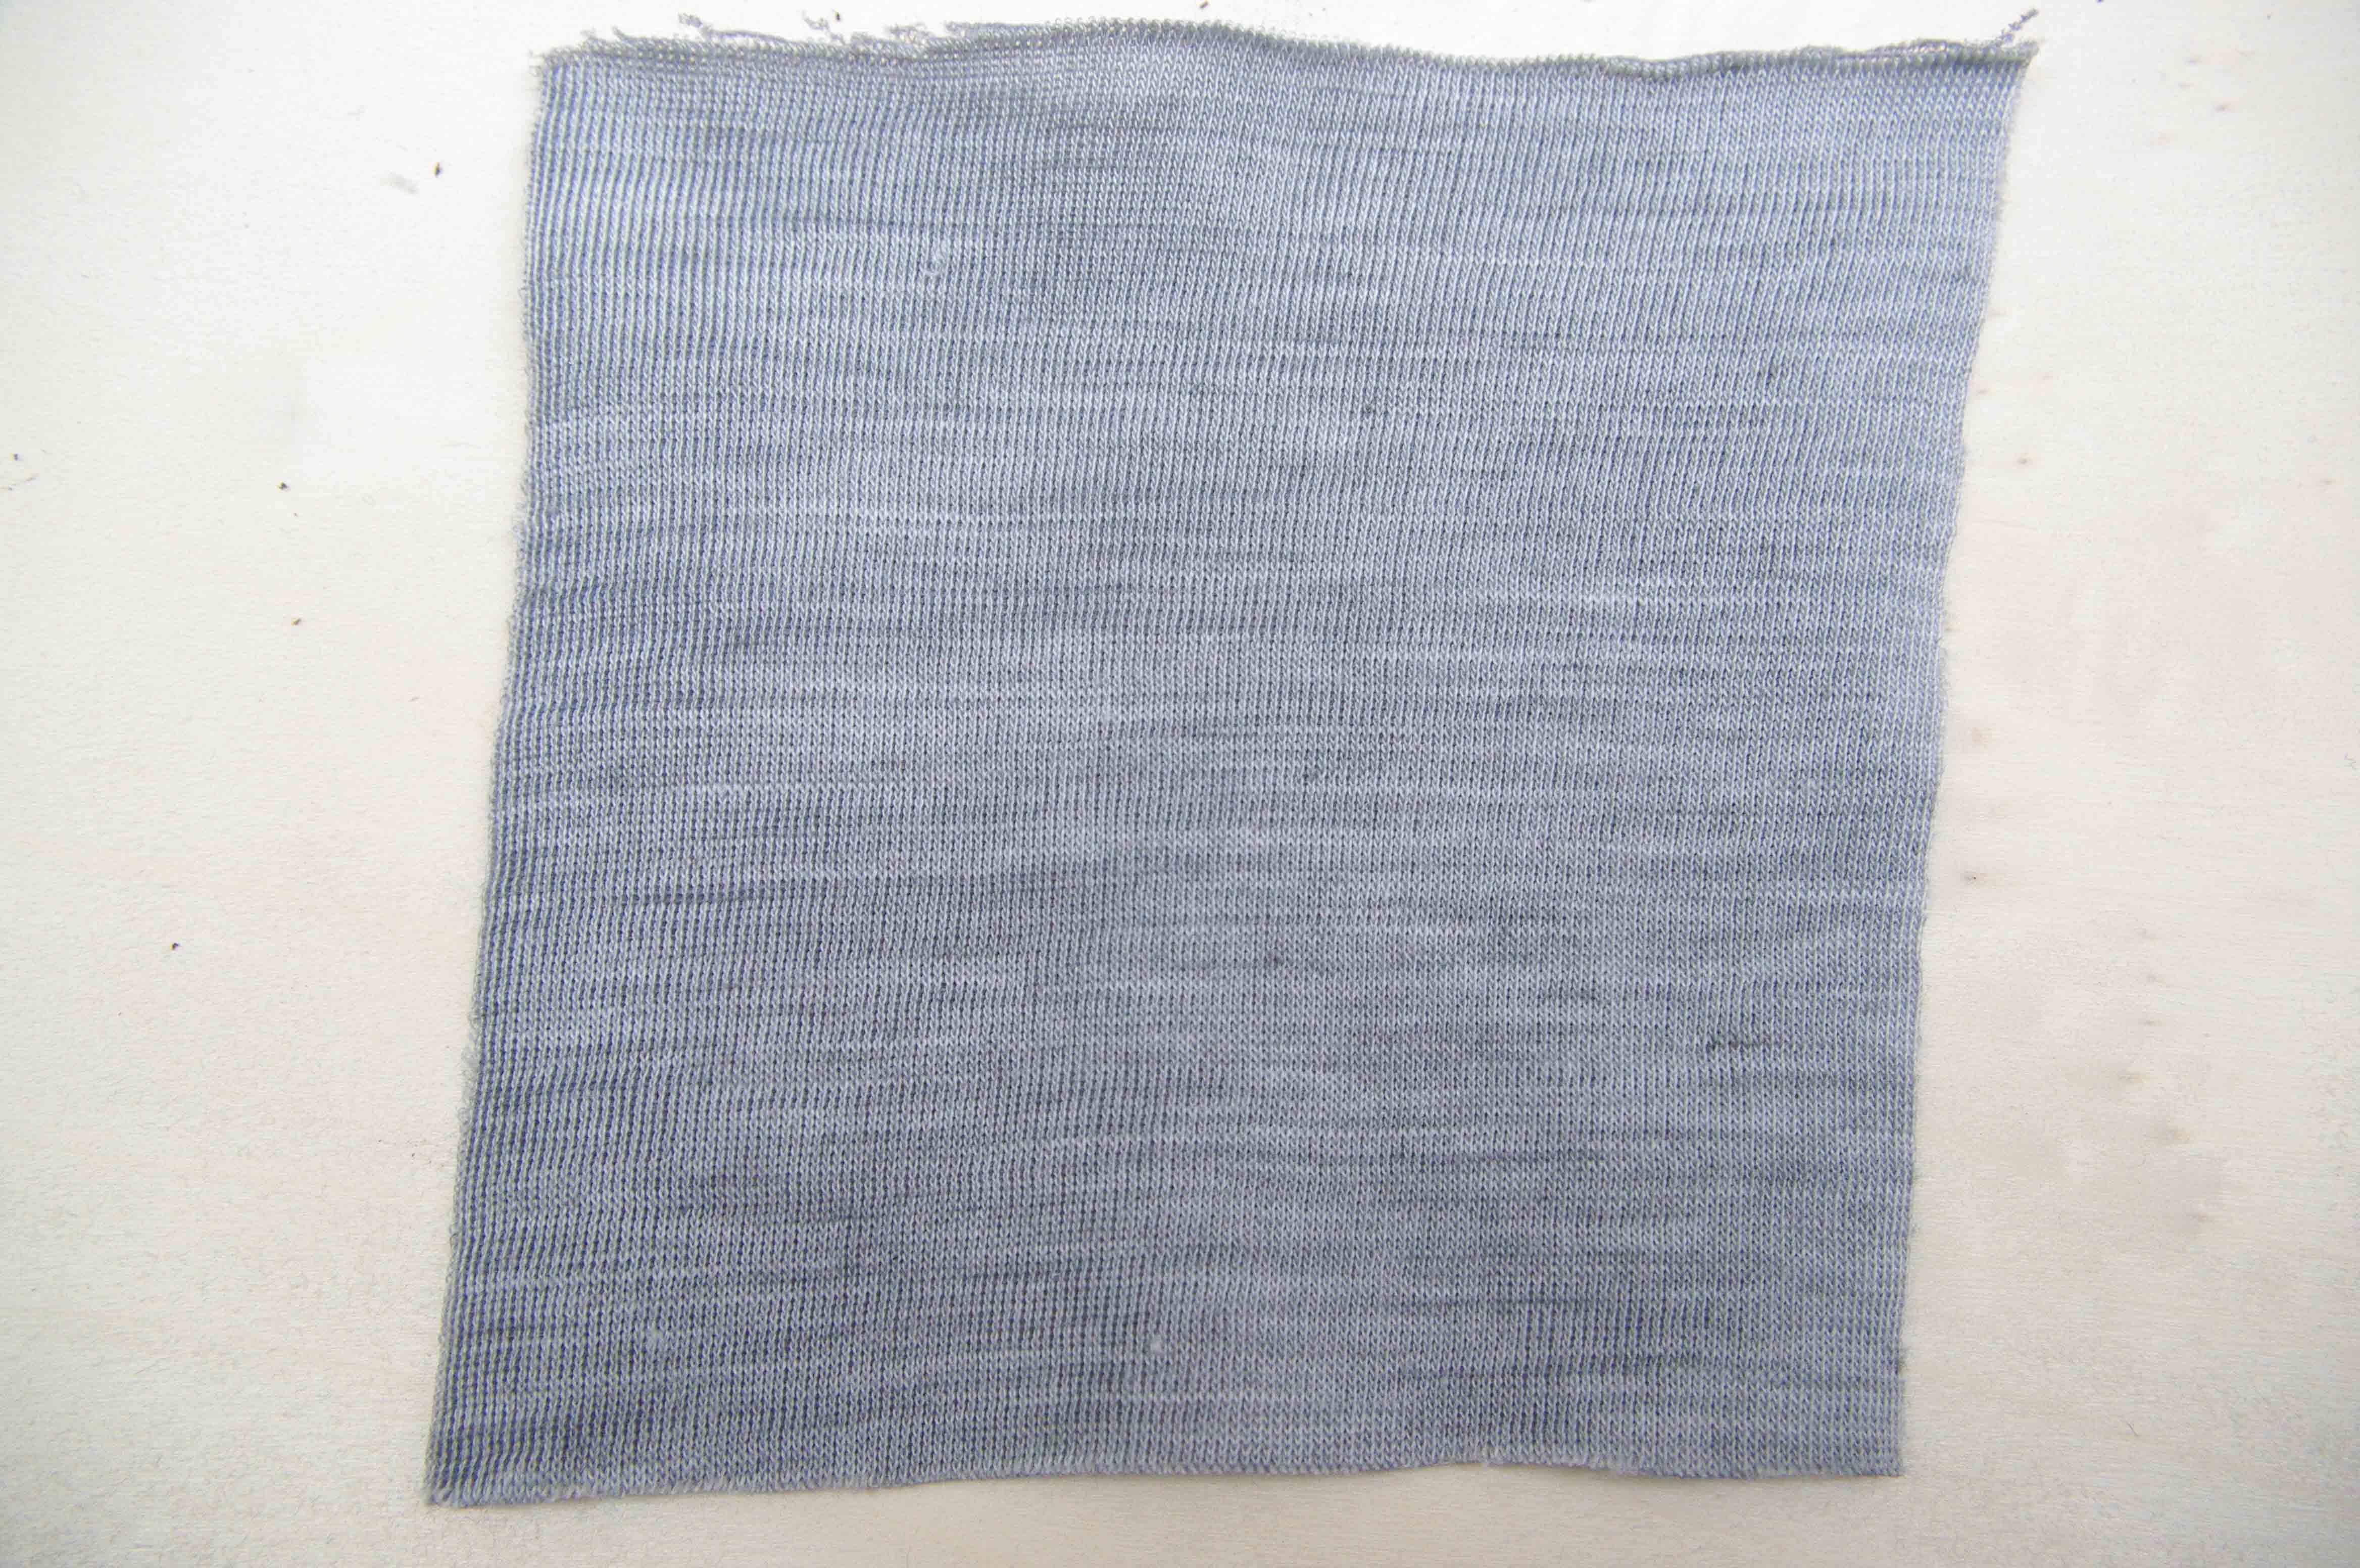 resistive_knitting_inoxside